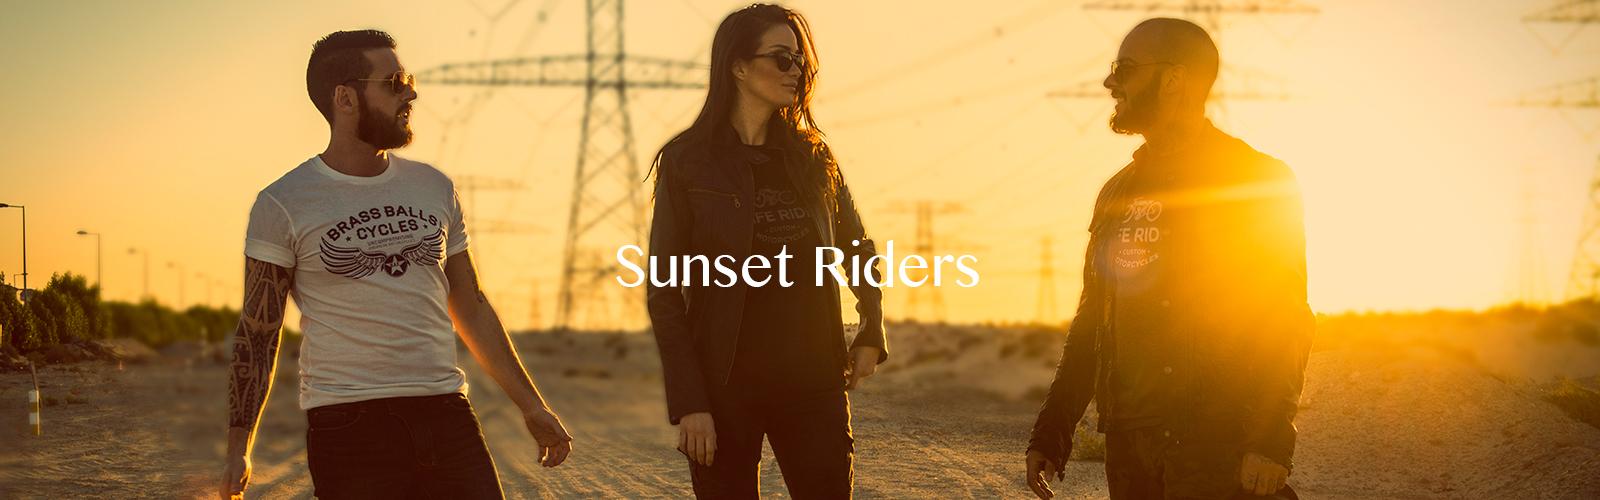 Sunset Riders photo page